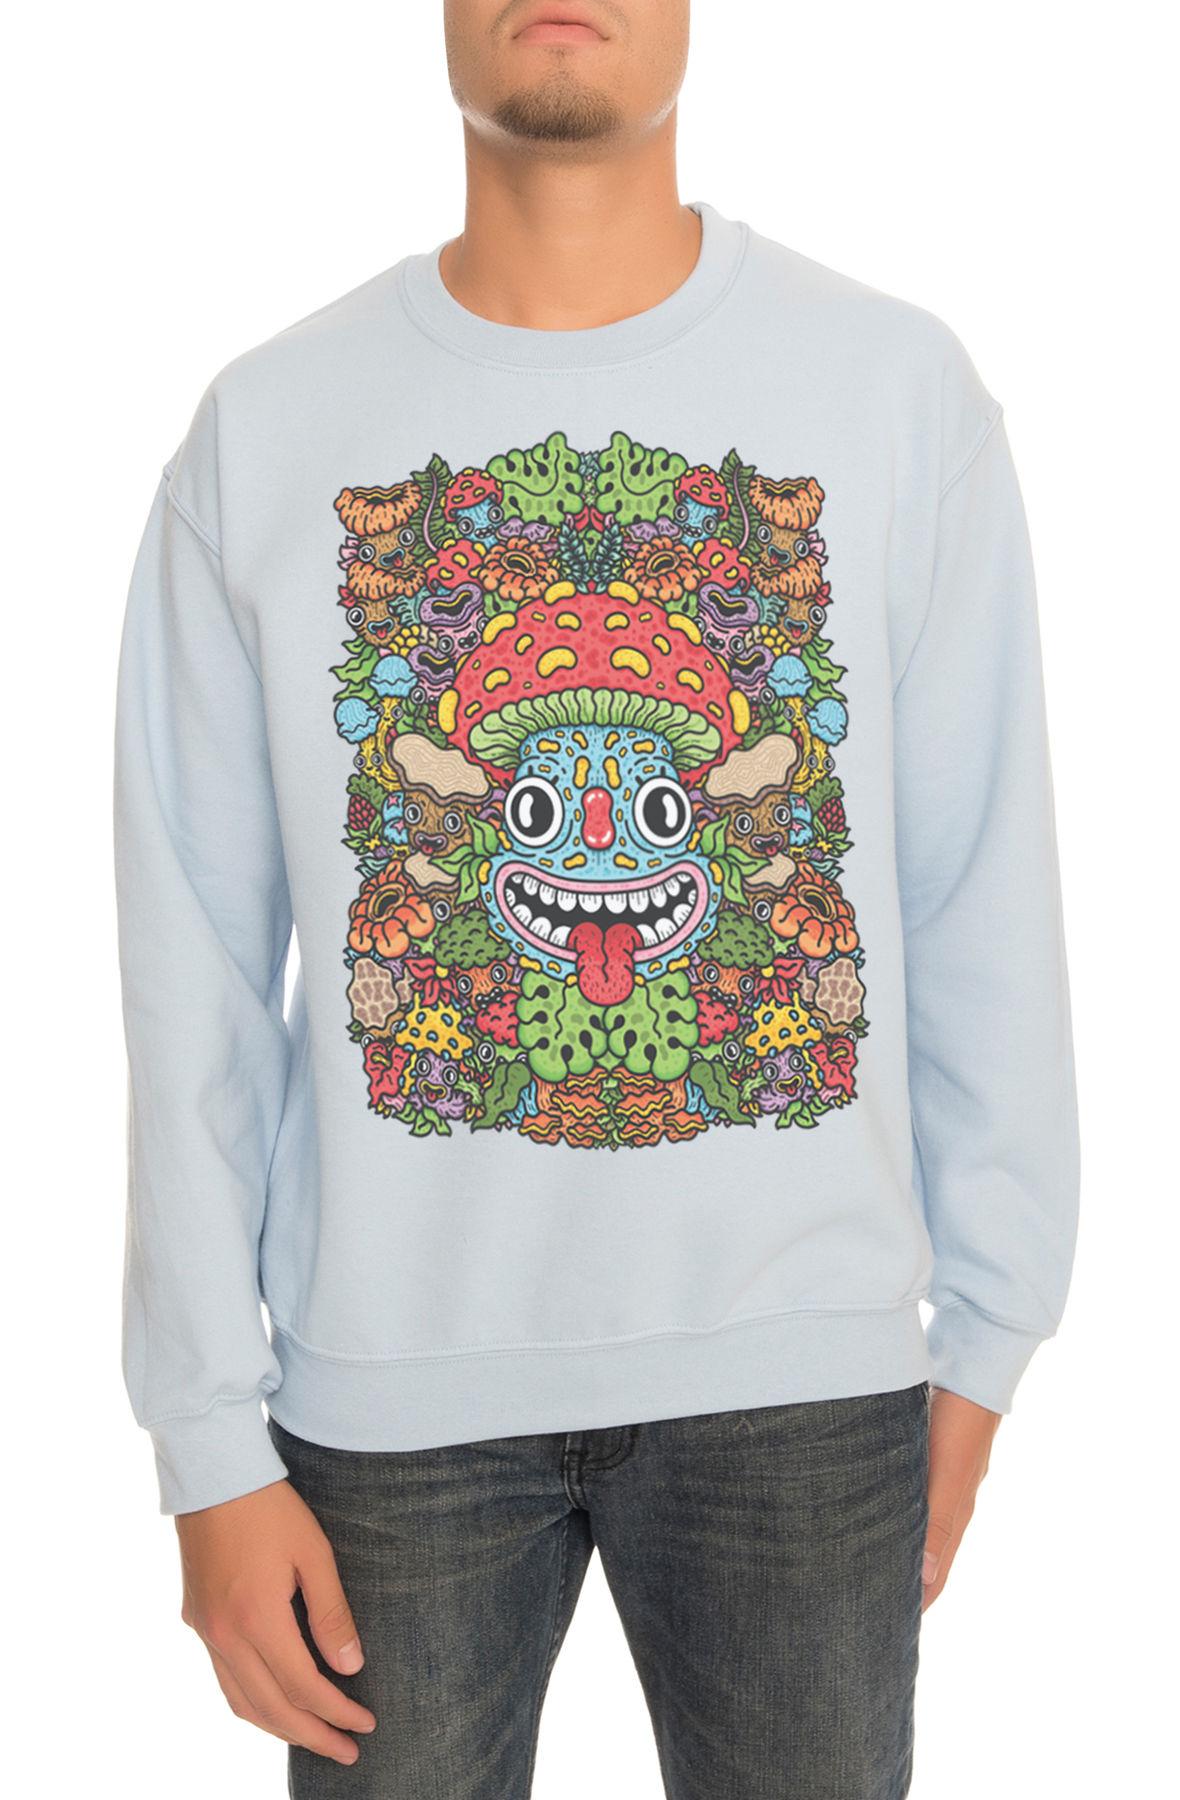 Image of The Champignon Crewneck Sweatshirt in Light Blue